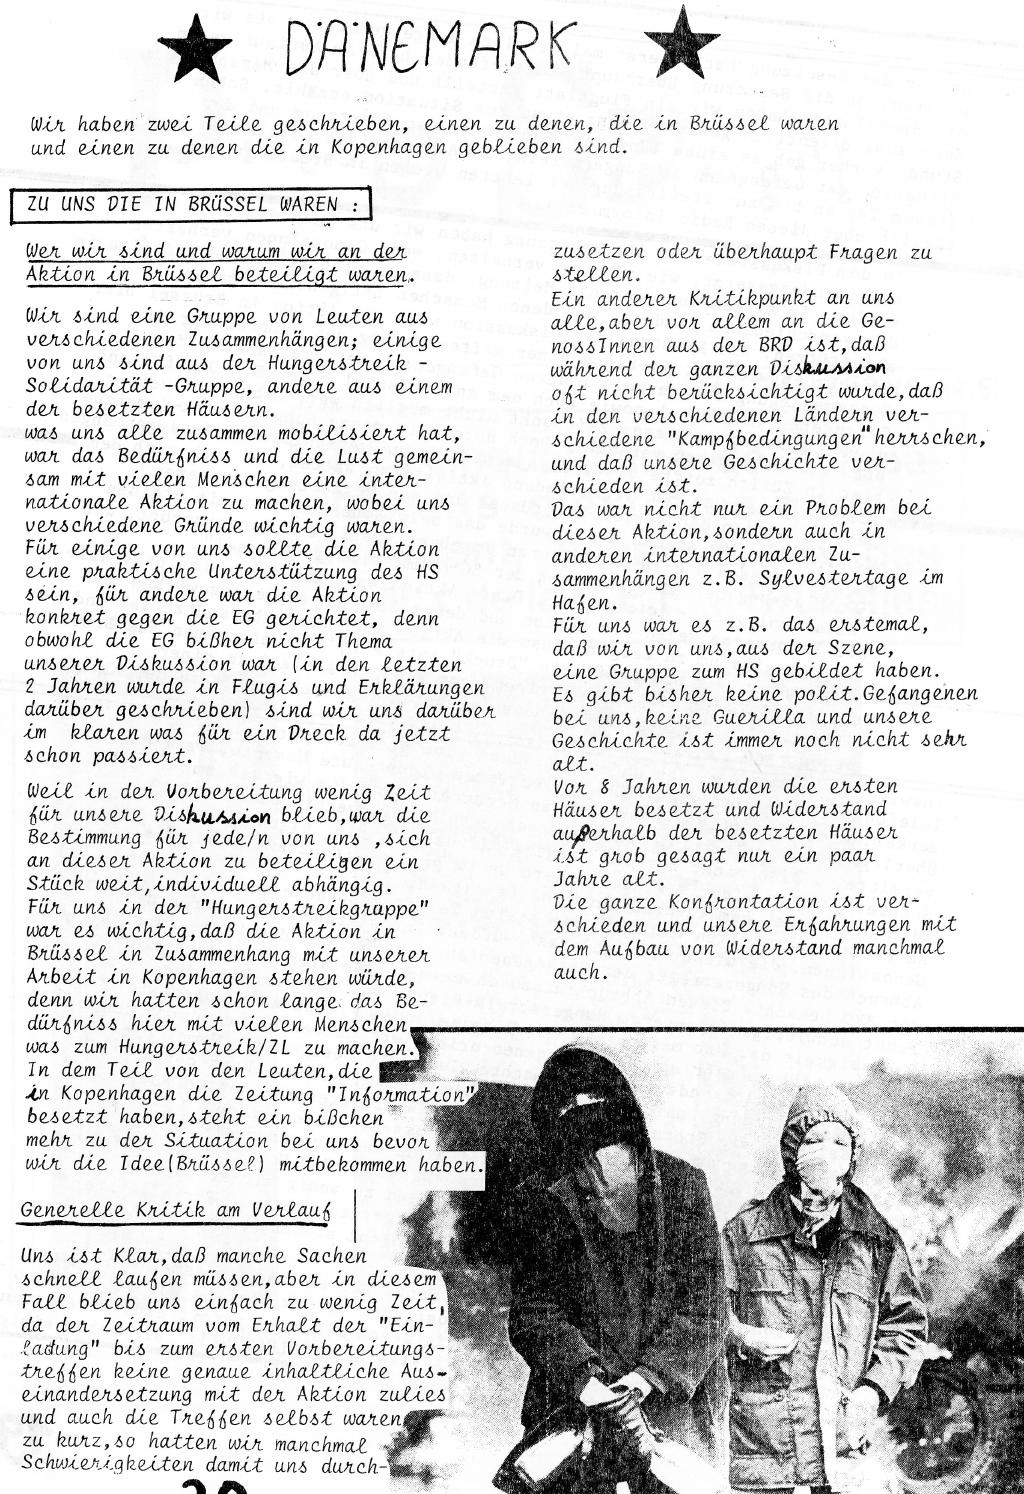 Belgien_Doku_Besetzung_EG_Kommission_1989_022